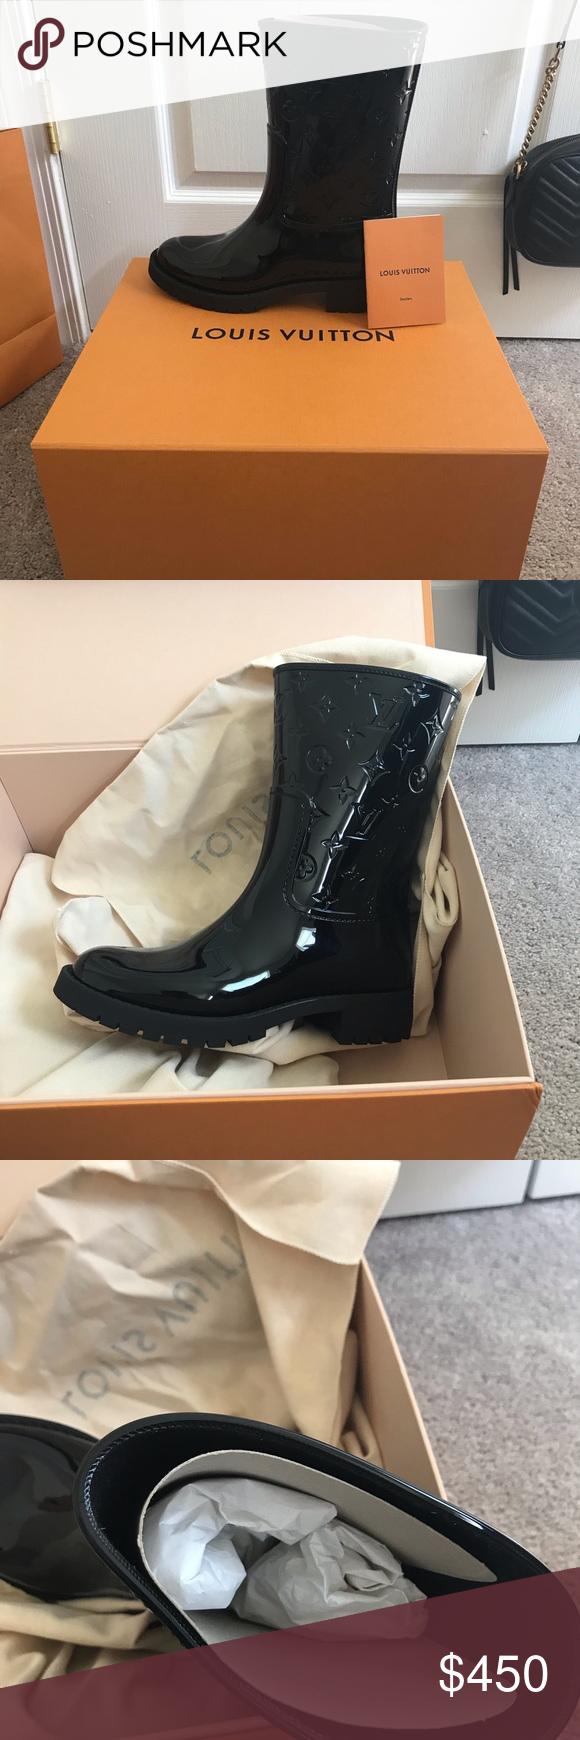 b04a536861 Louis Vuitton Drops Flat Half Boot DROPS FLAT HALF BOOT BRAND NEW ...